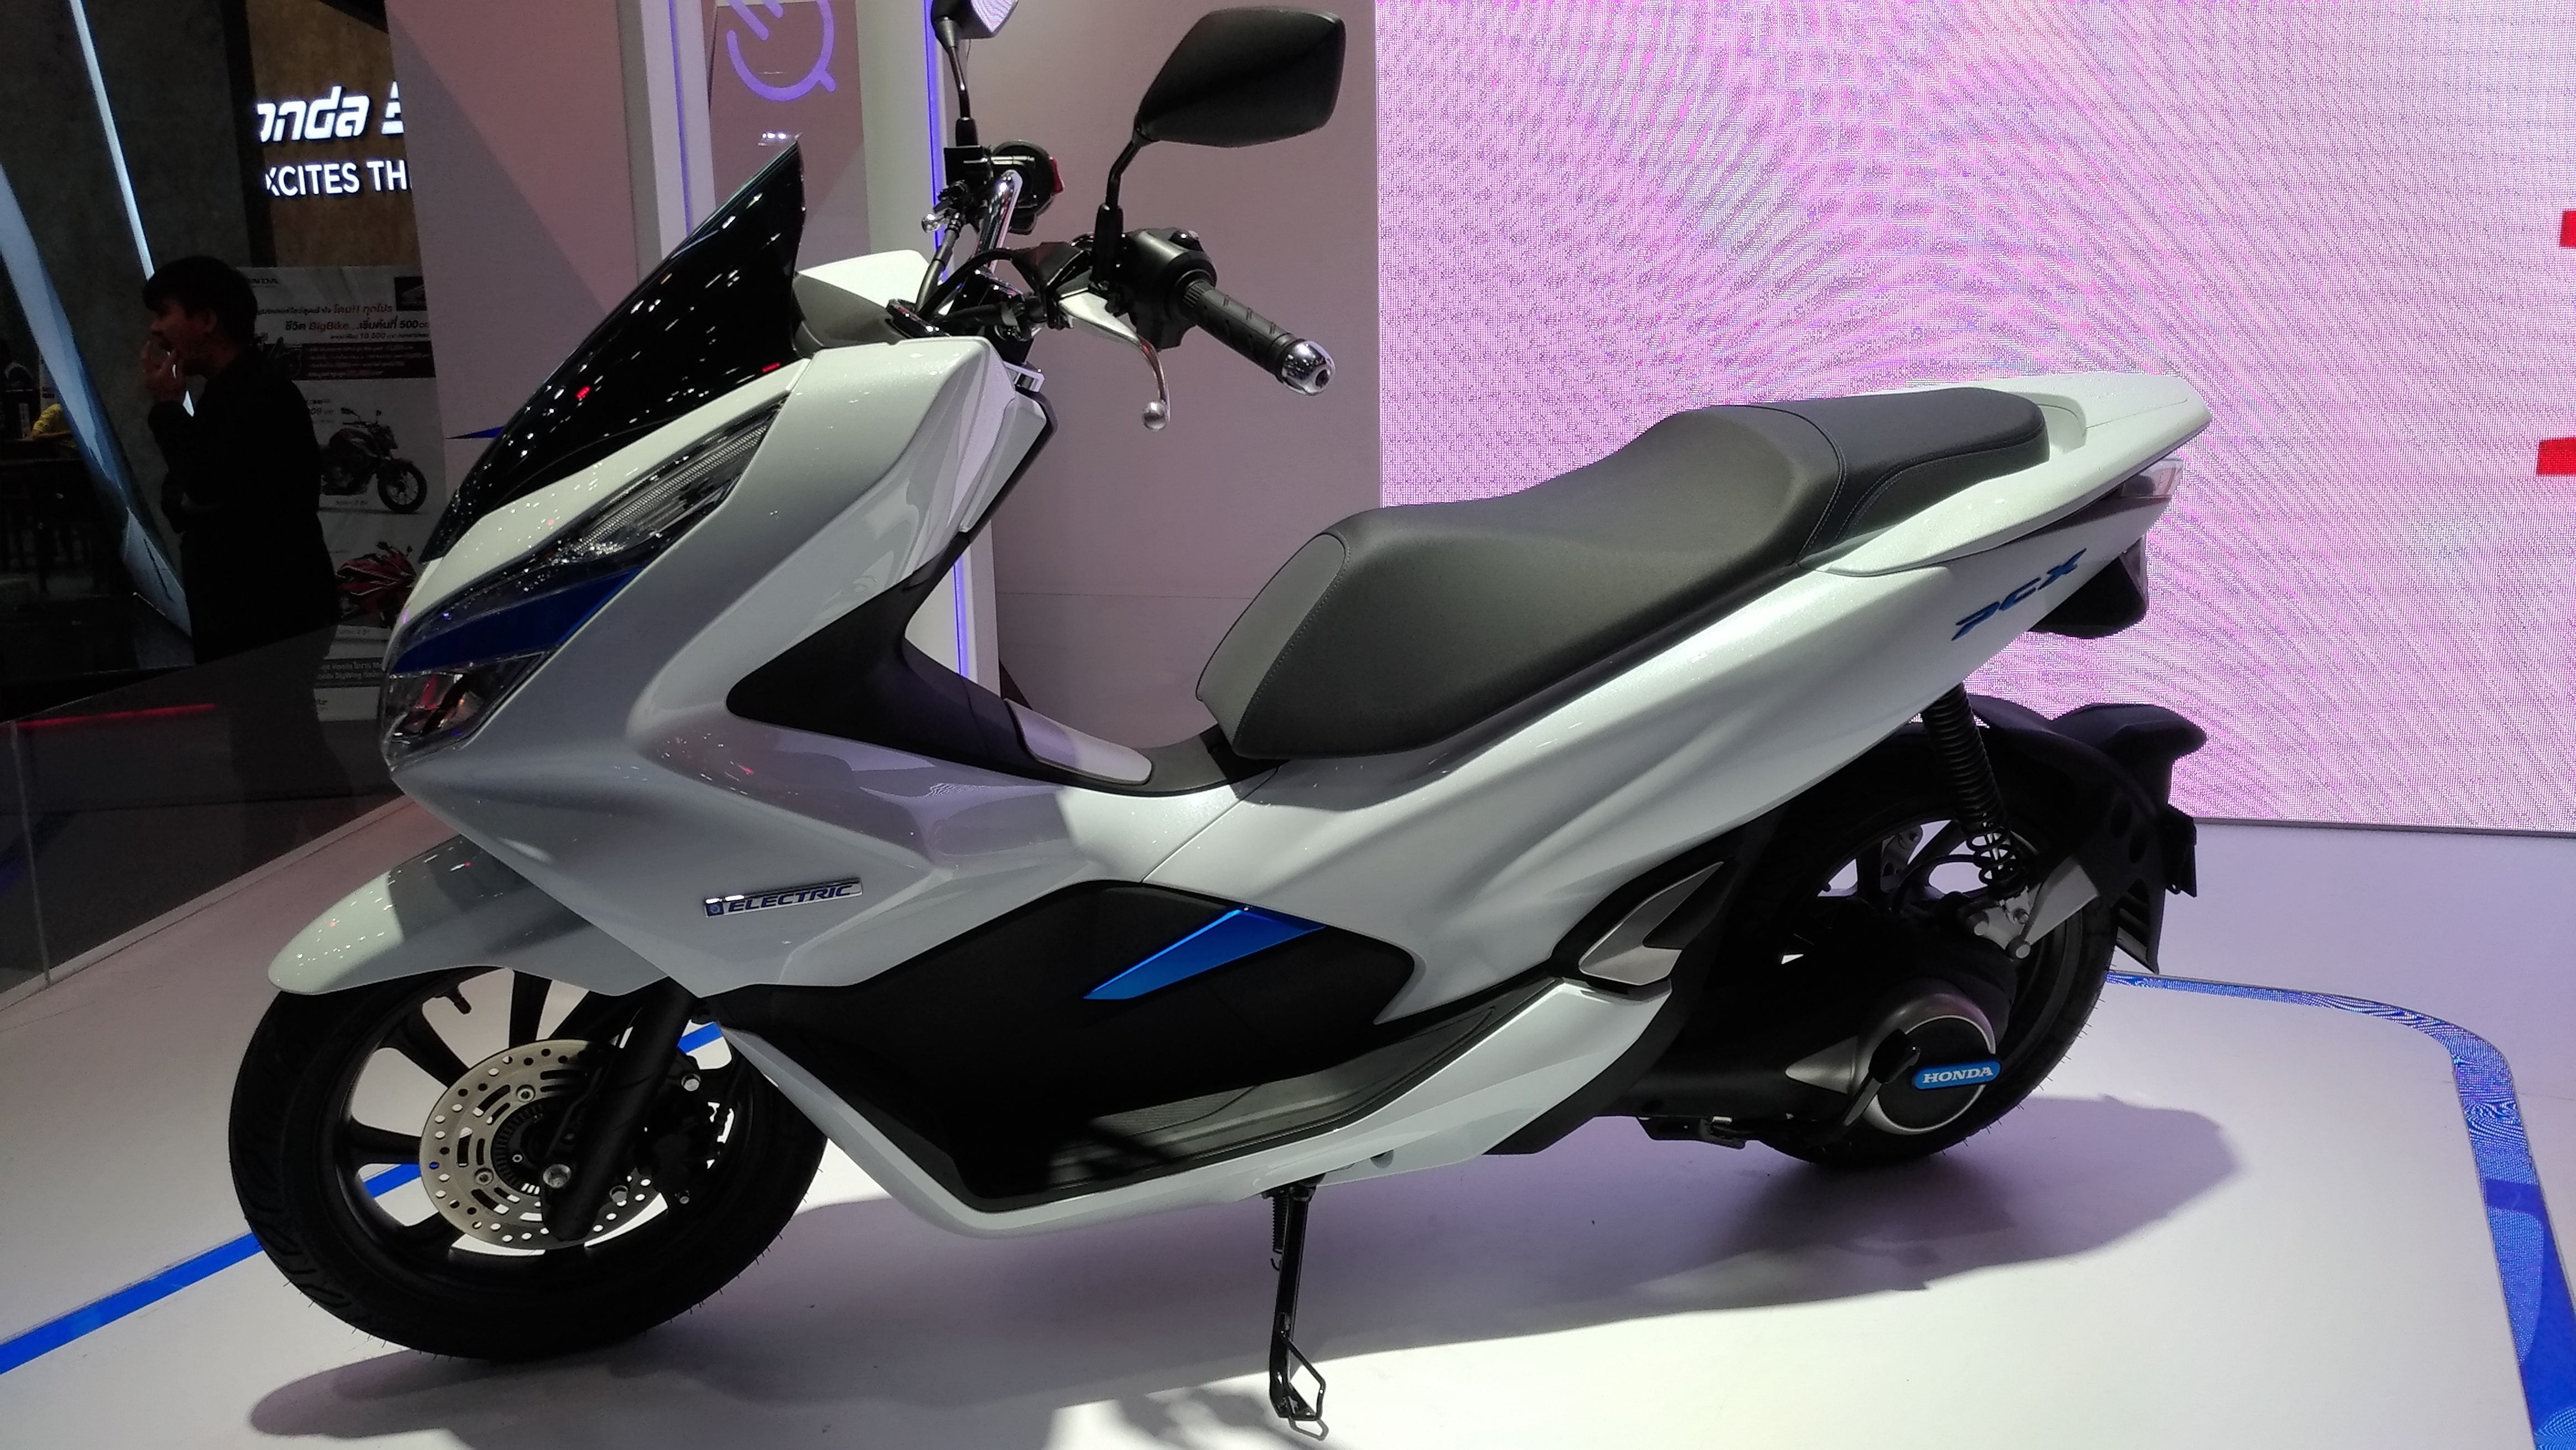 Honda Pcx Hybrid Motorcycles In Thailand Thailand Visa Forum By